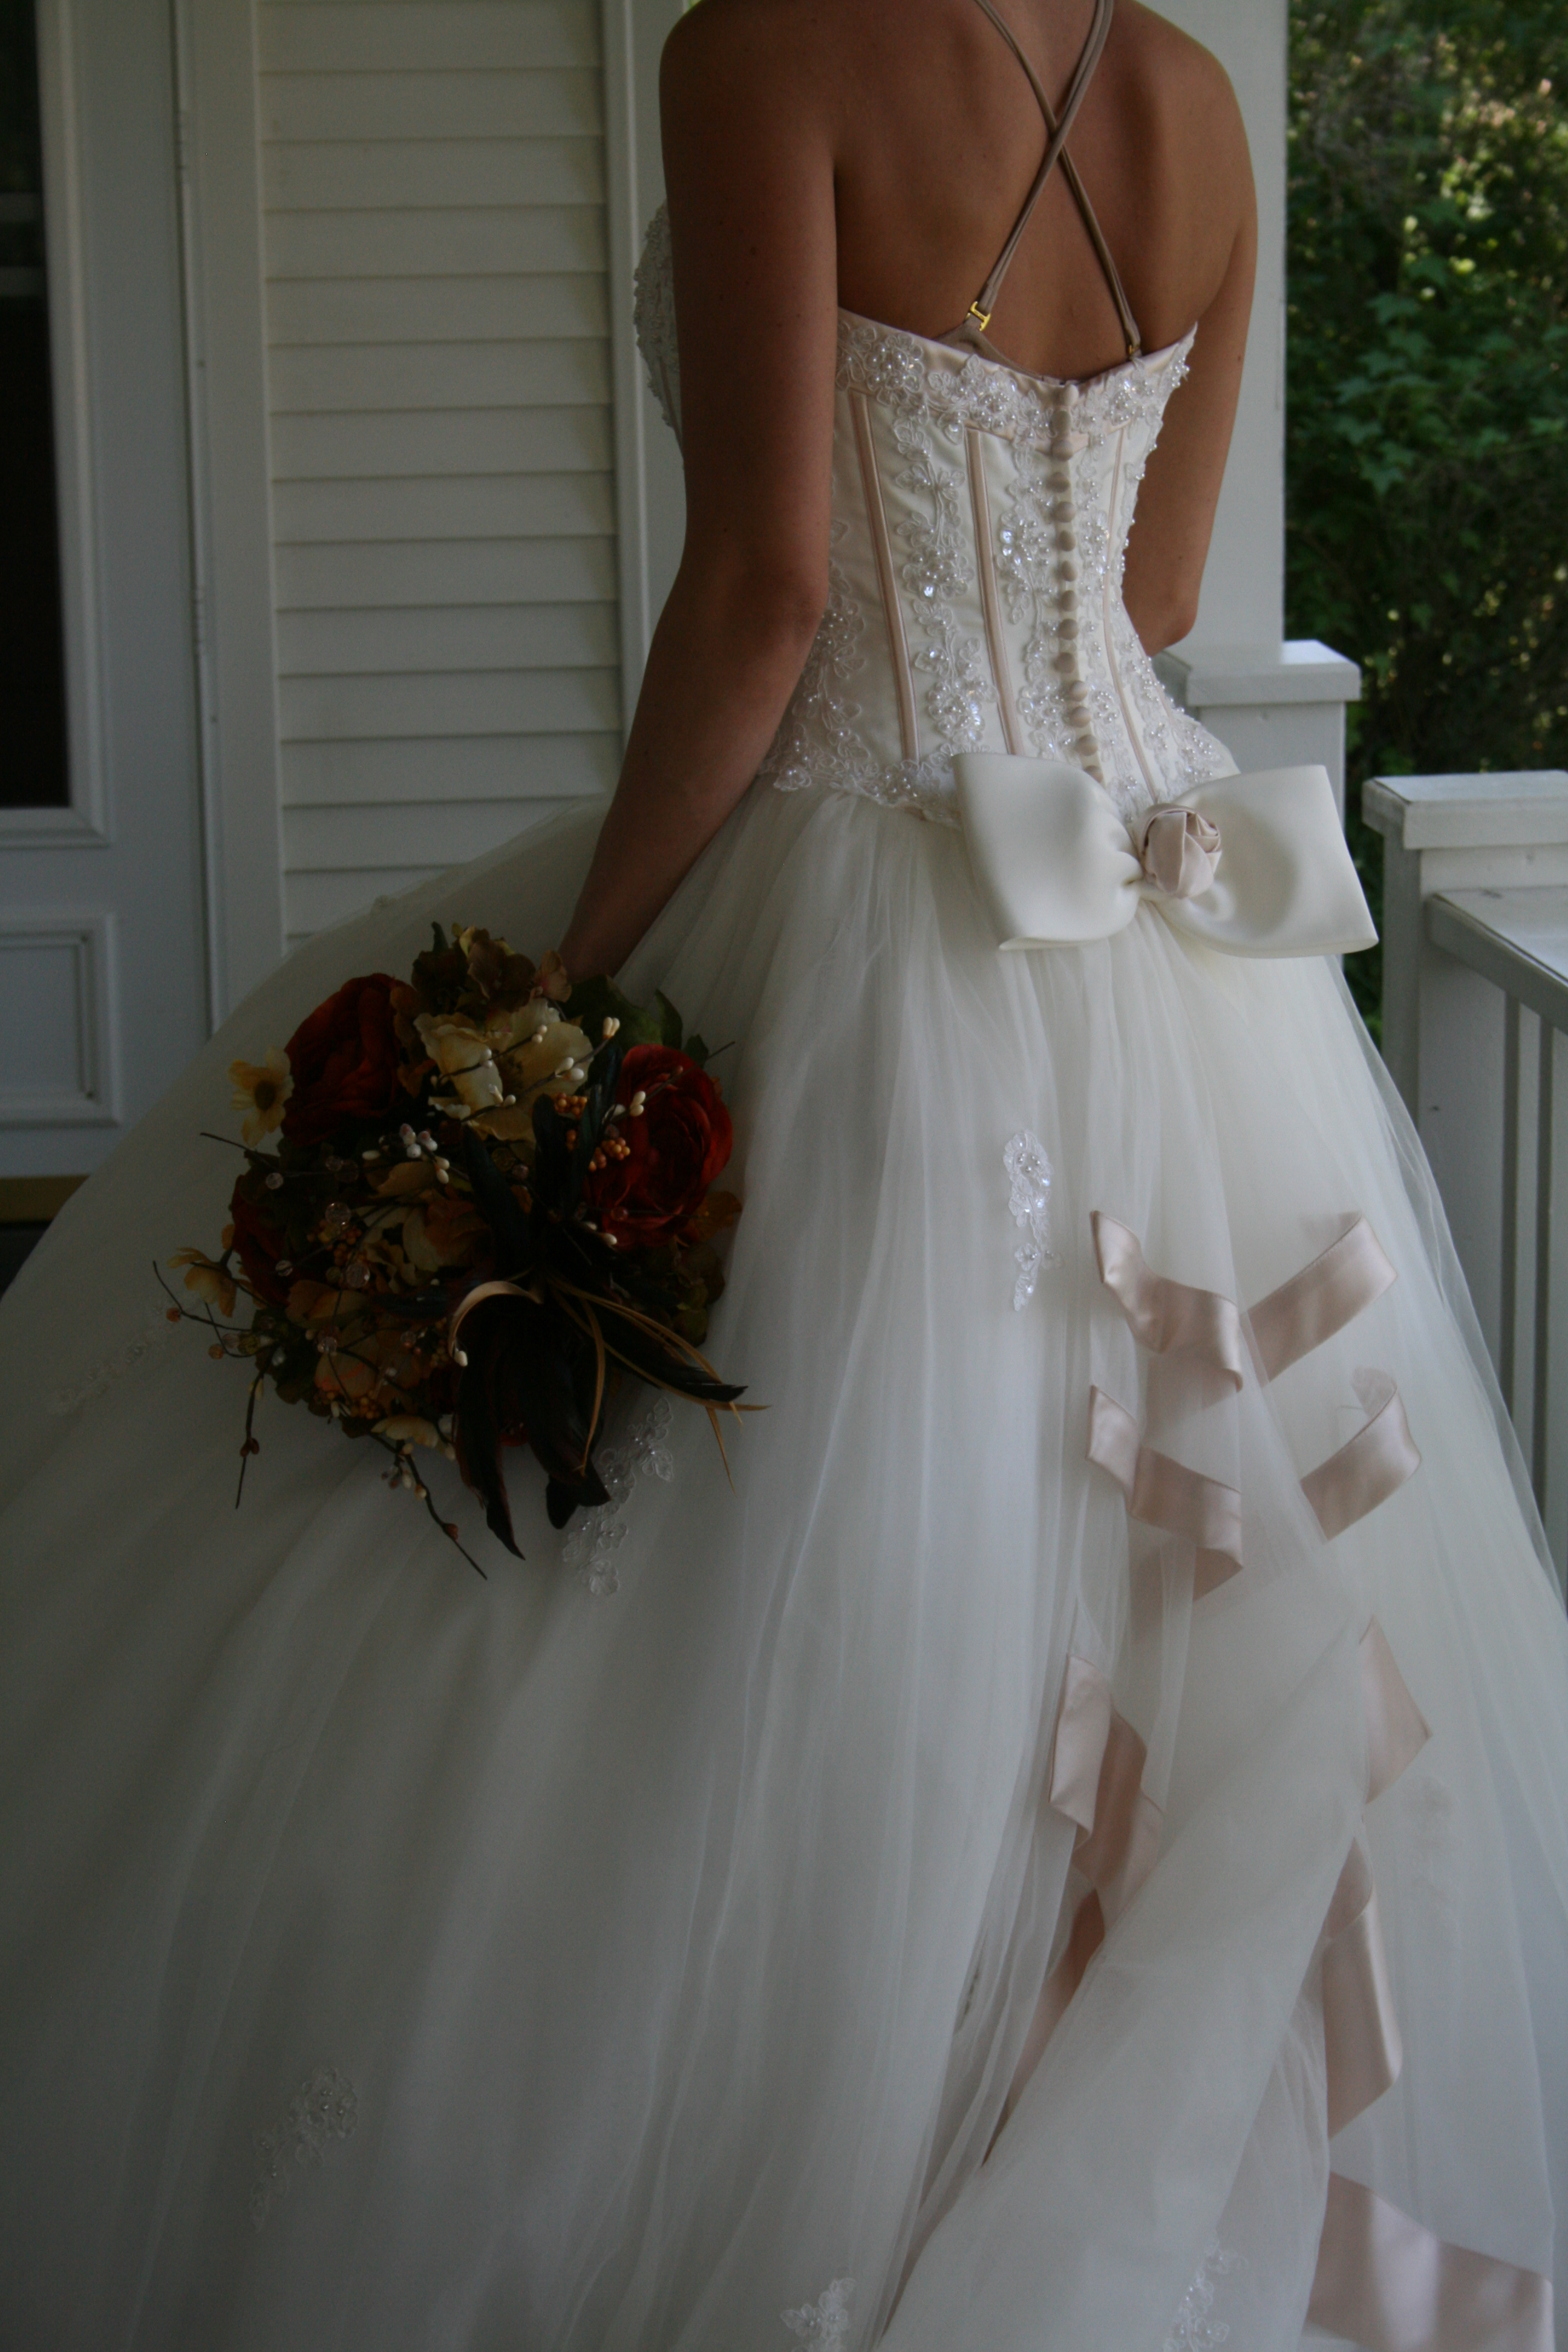 michaelangelo wedding dresses photo - 1